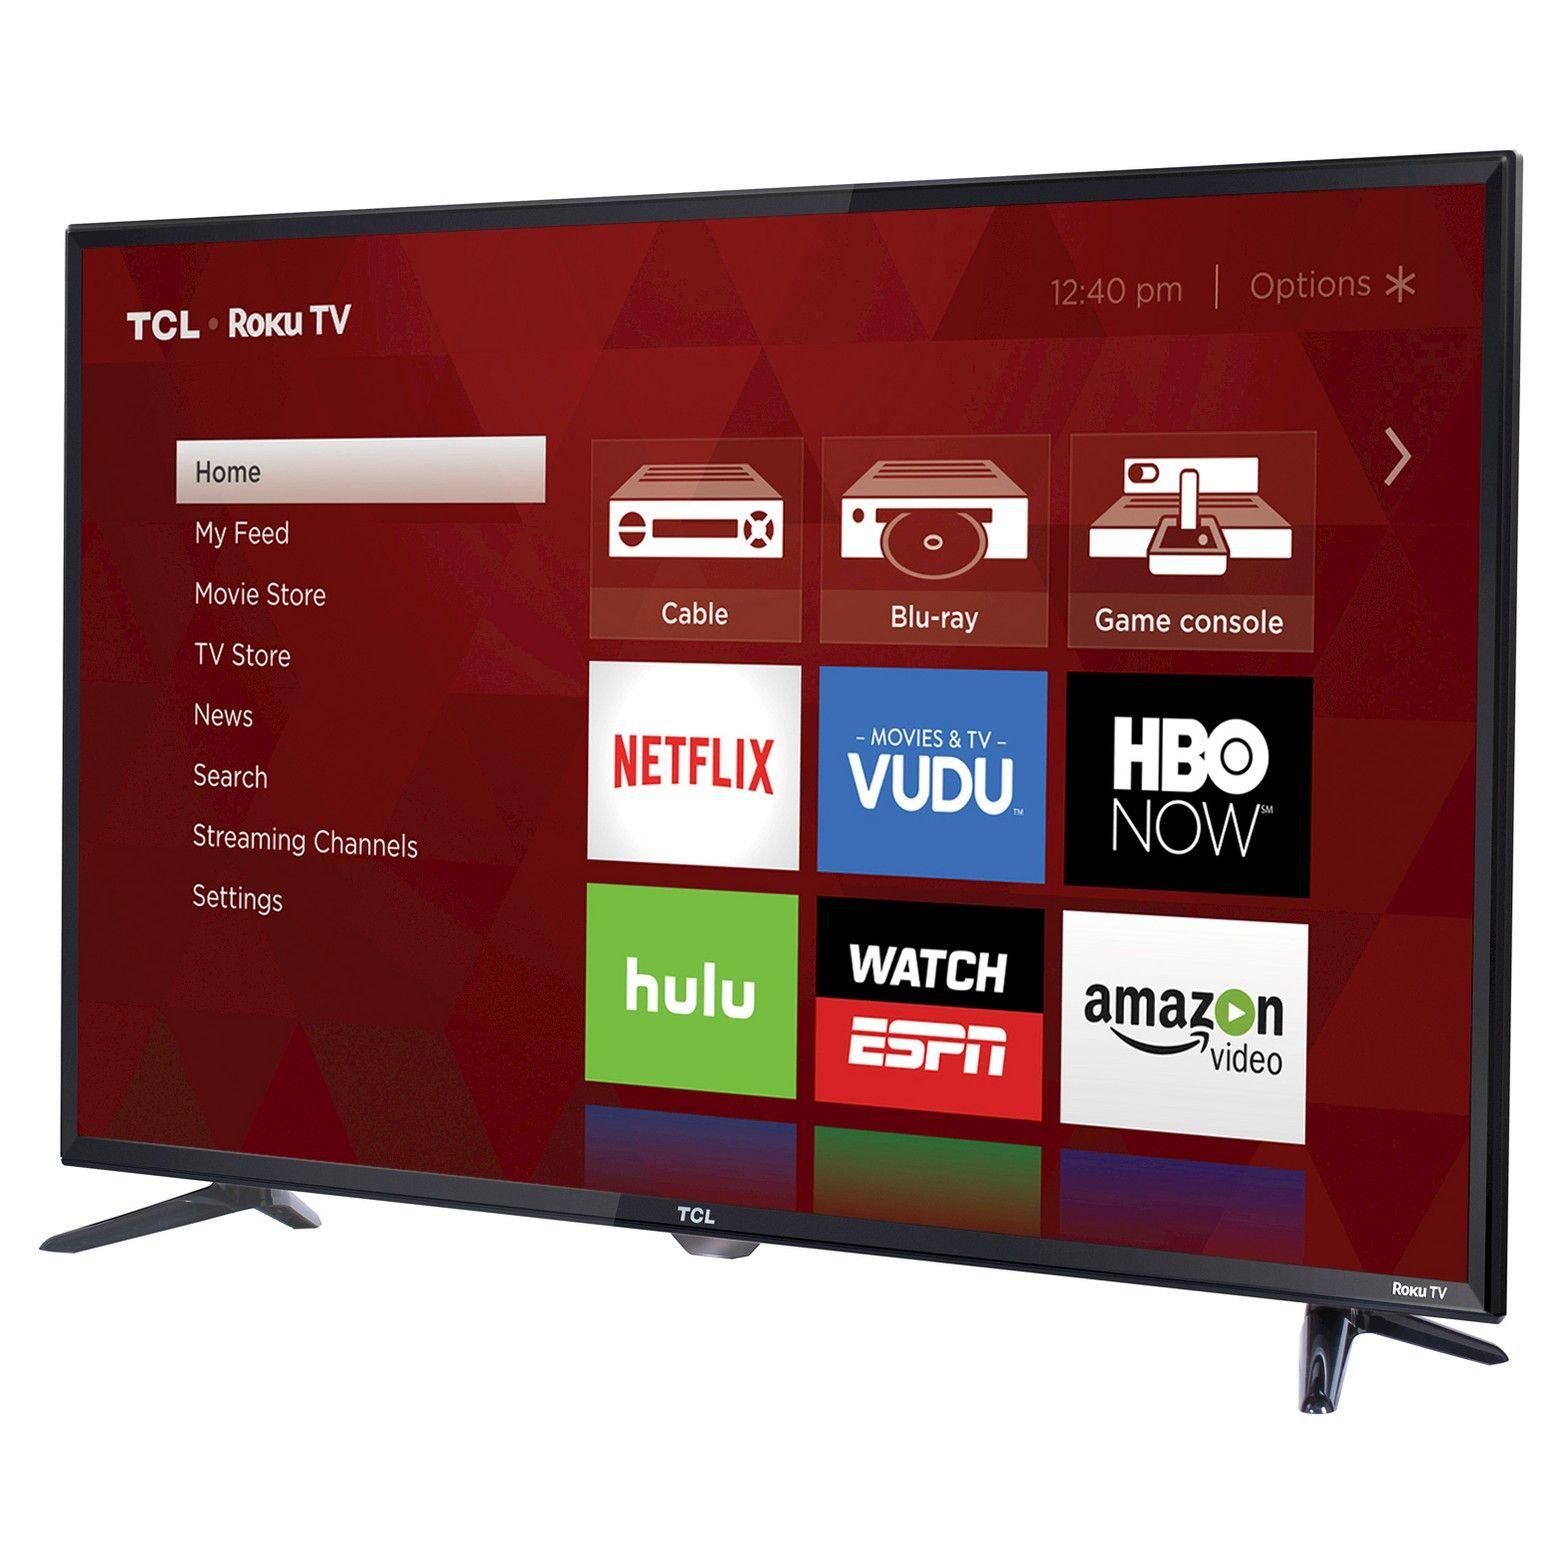 Tcl 40 1080p Smart Led Roku Tv 40s325 In 2020 Smart Tv Led Tv Tv